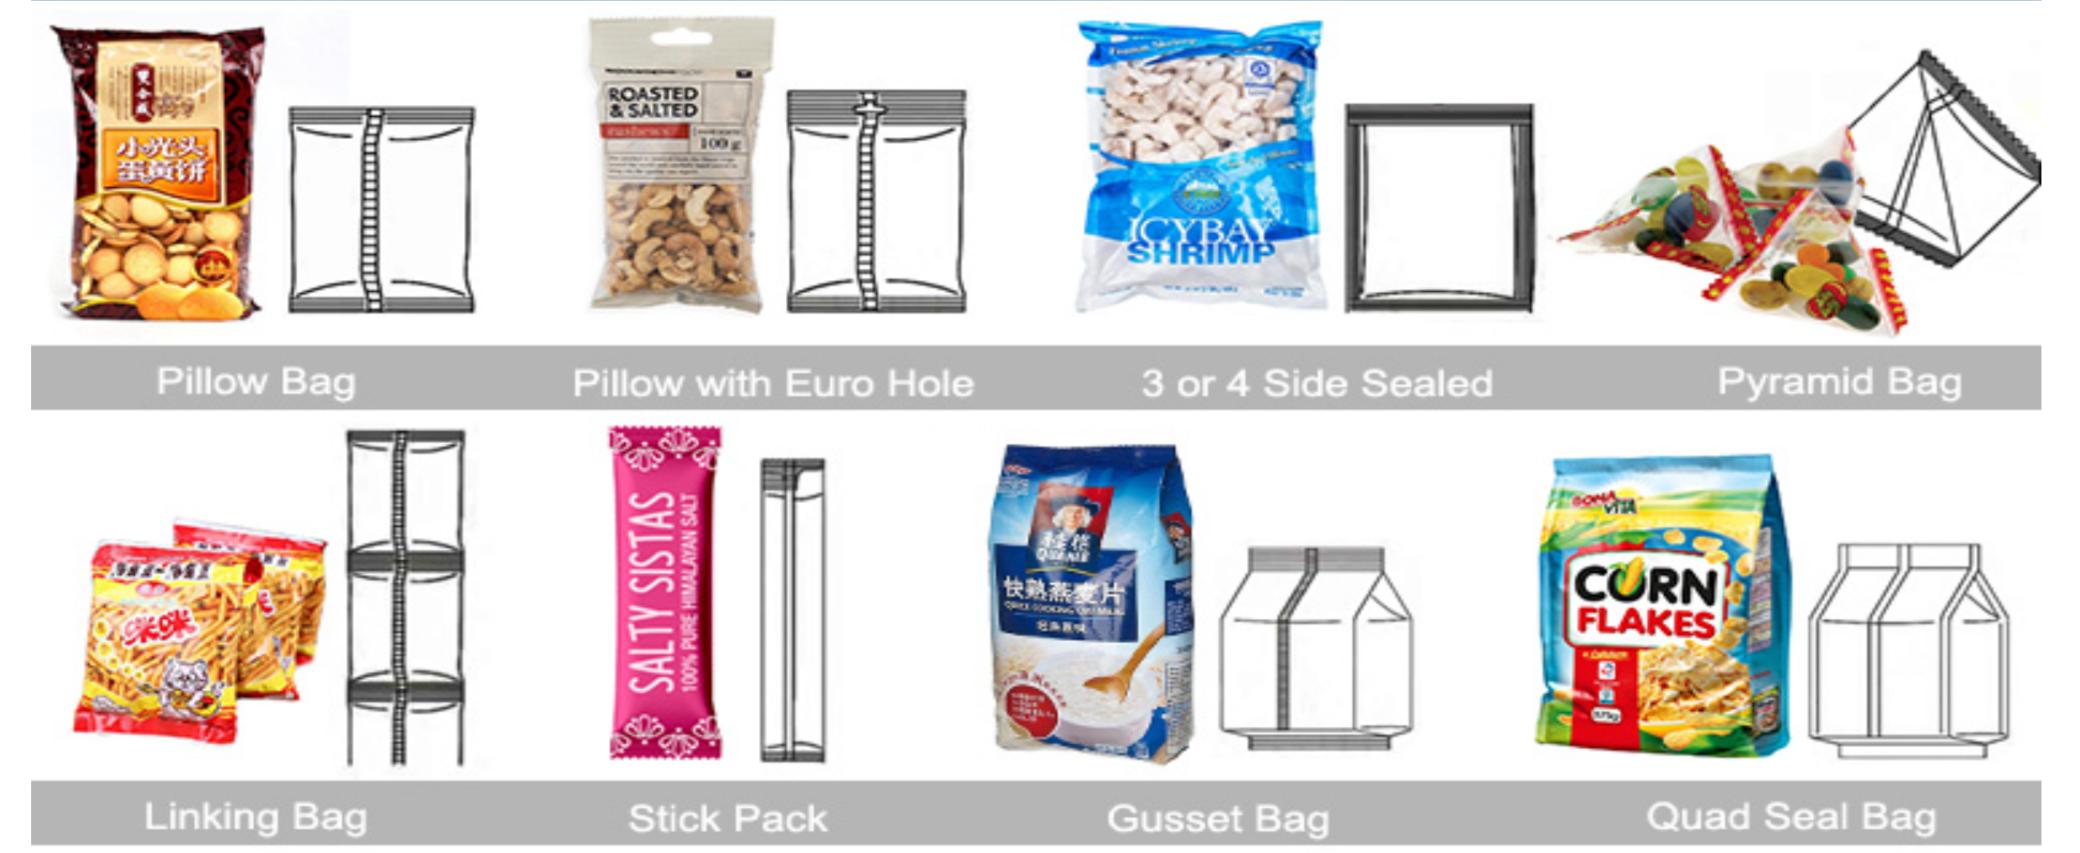 potato chips packaging